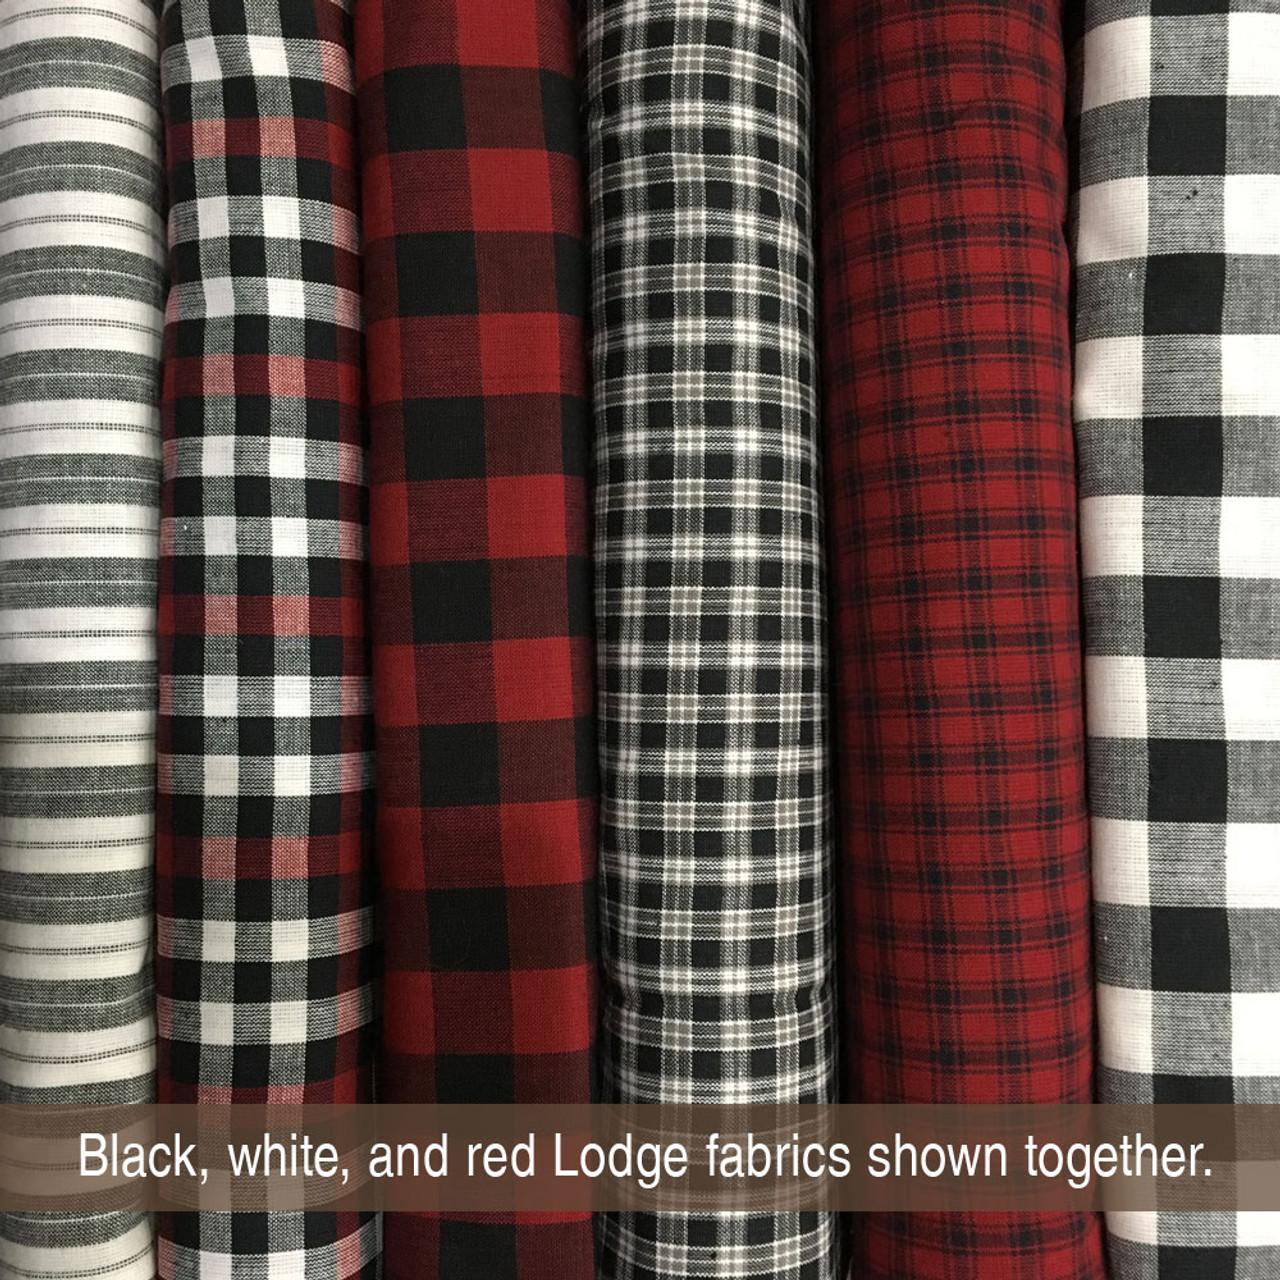 Mountain Lodge 3 Red Plaid Homespun Cotton Fabric